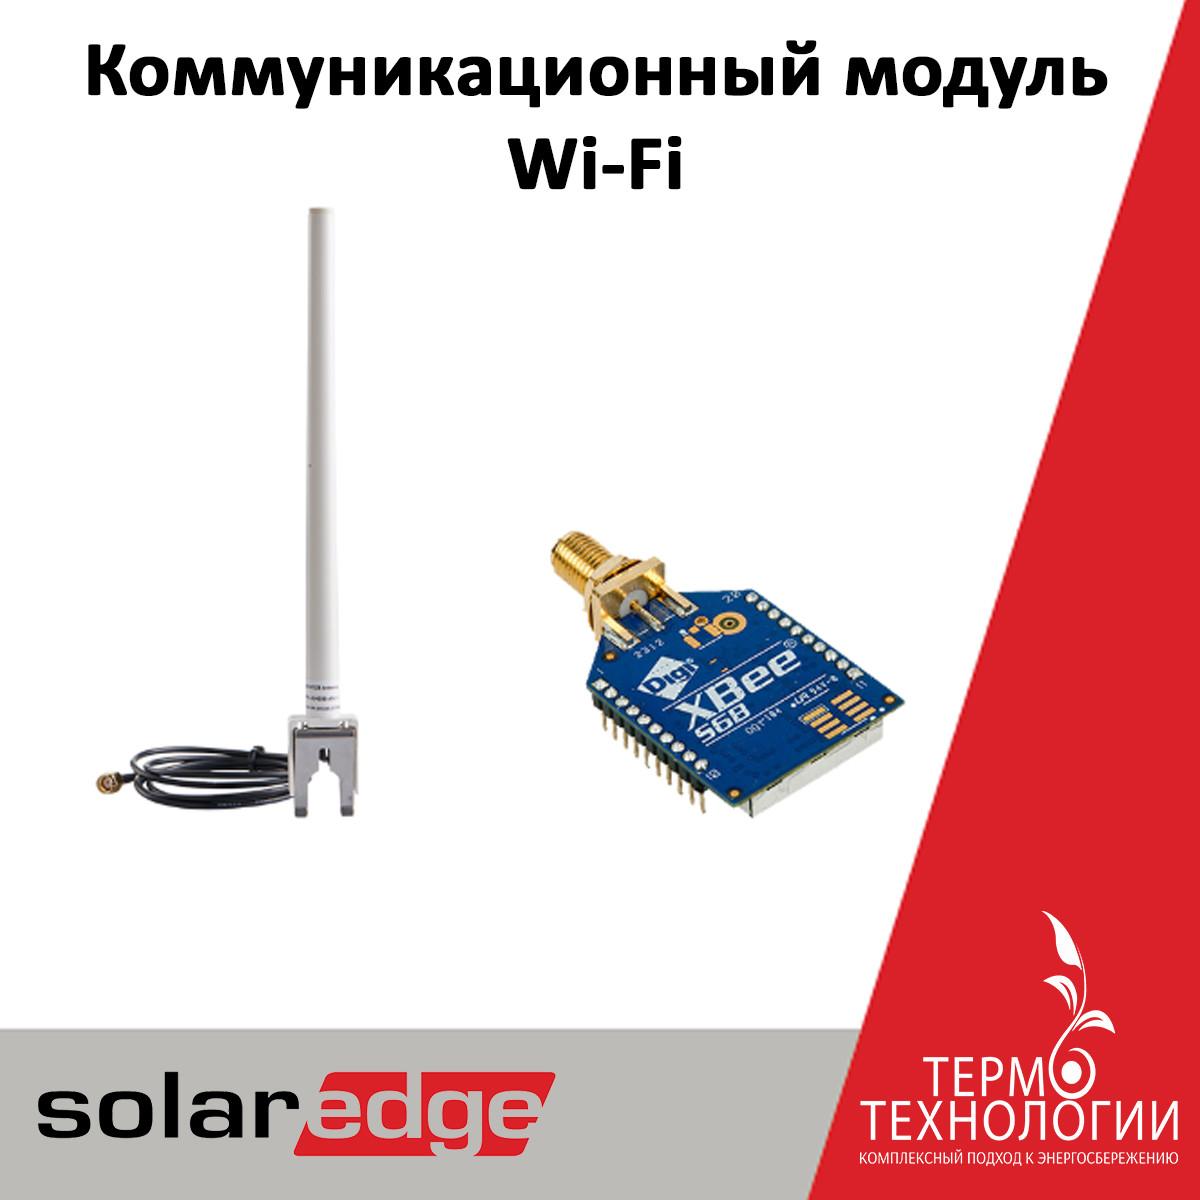 Коммуникационный модуль Wi-Fi SolarEdge